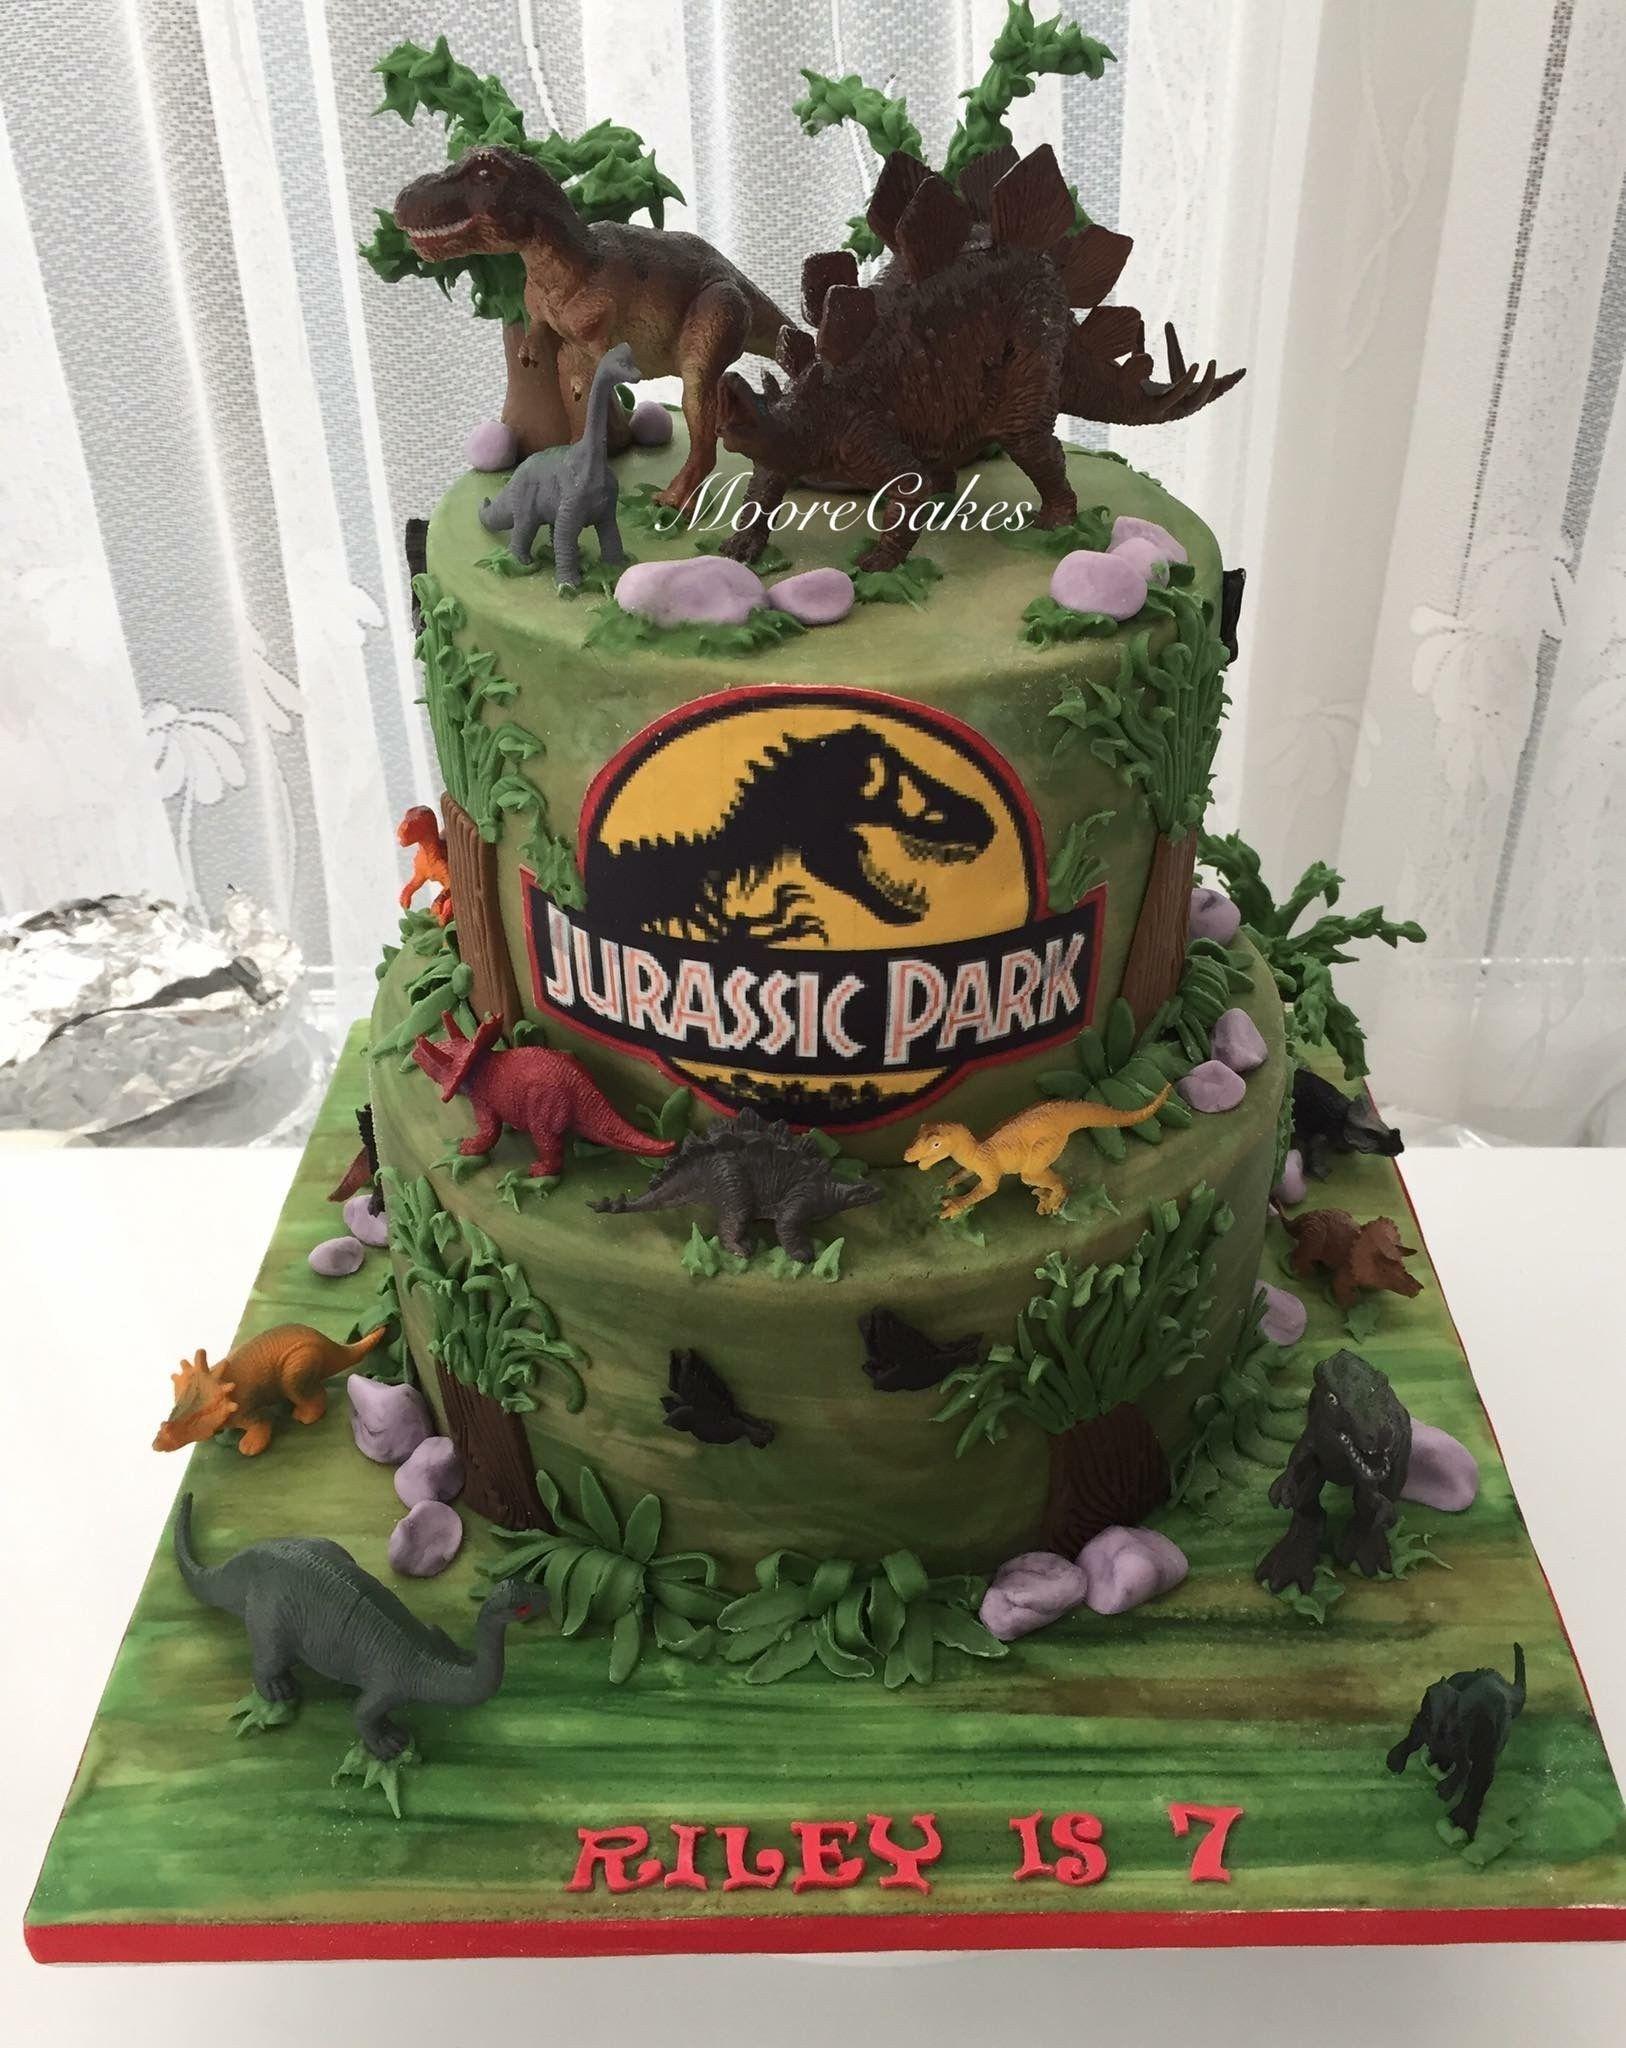 30 Amazing Photo Of Jurassic Park Birthday Cake Jurassic Park